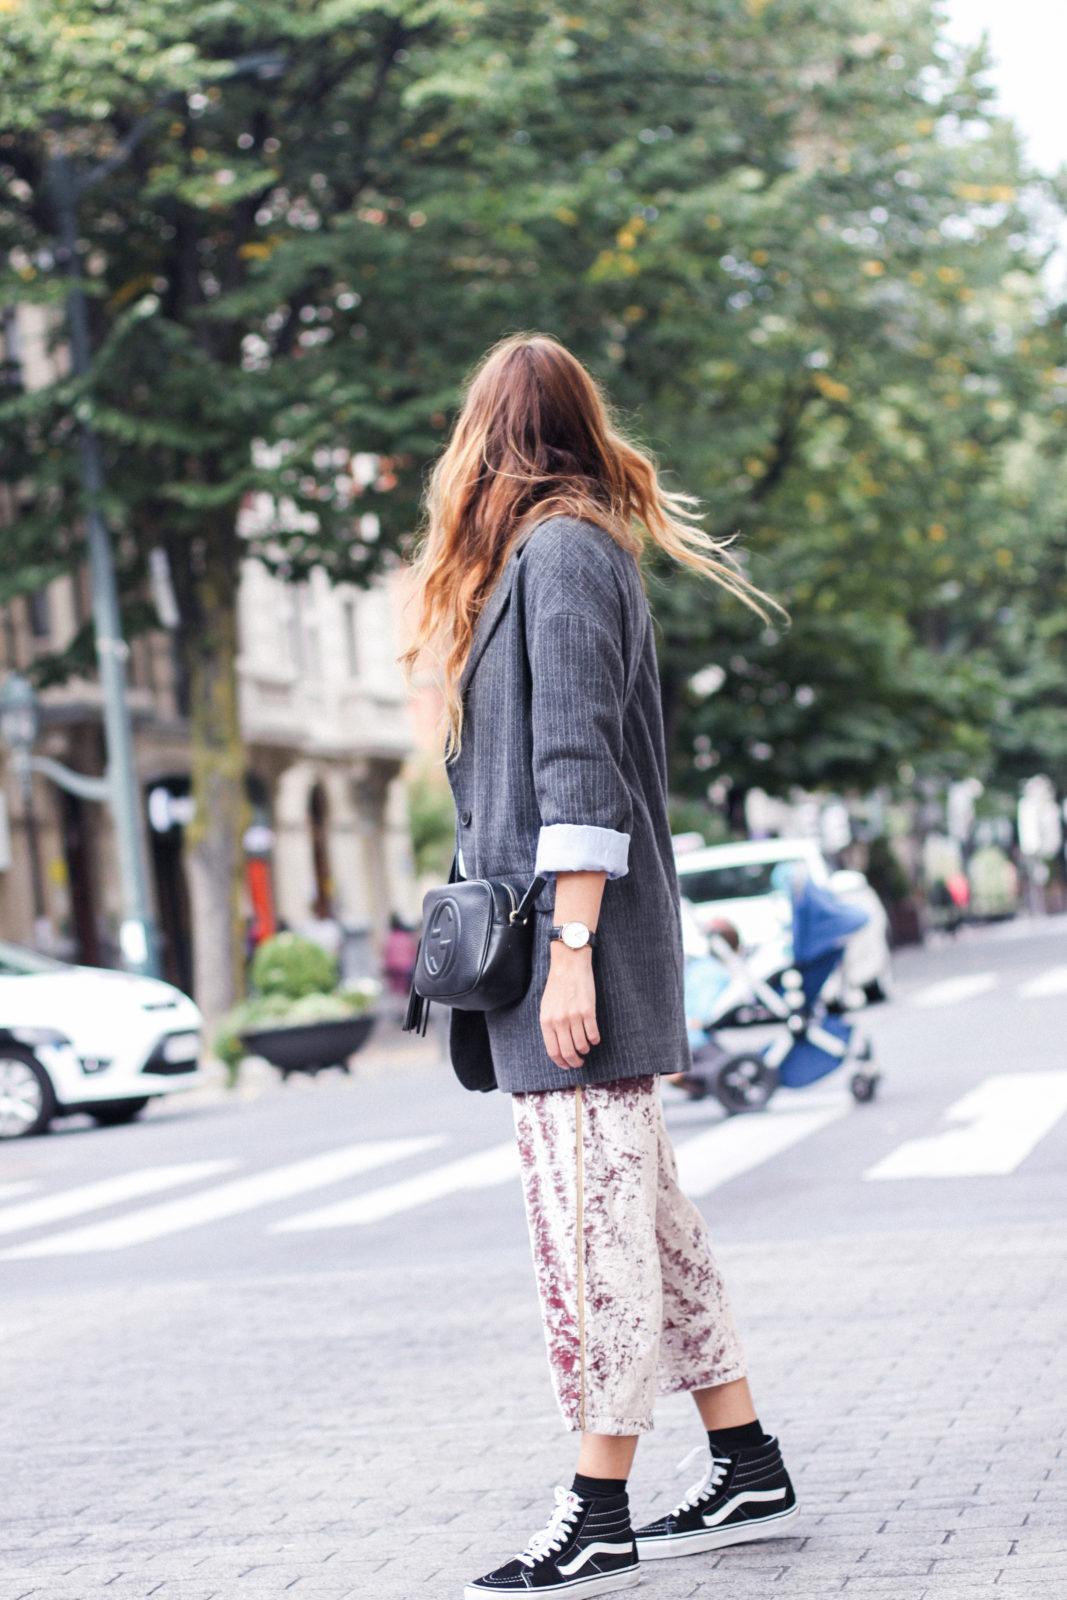 pantalones_terciopelo_rosa_pull_and_bear_blazer_vans_pendientes_aros_gucci-9